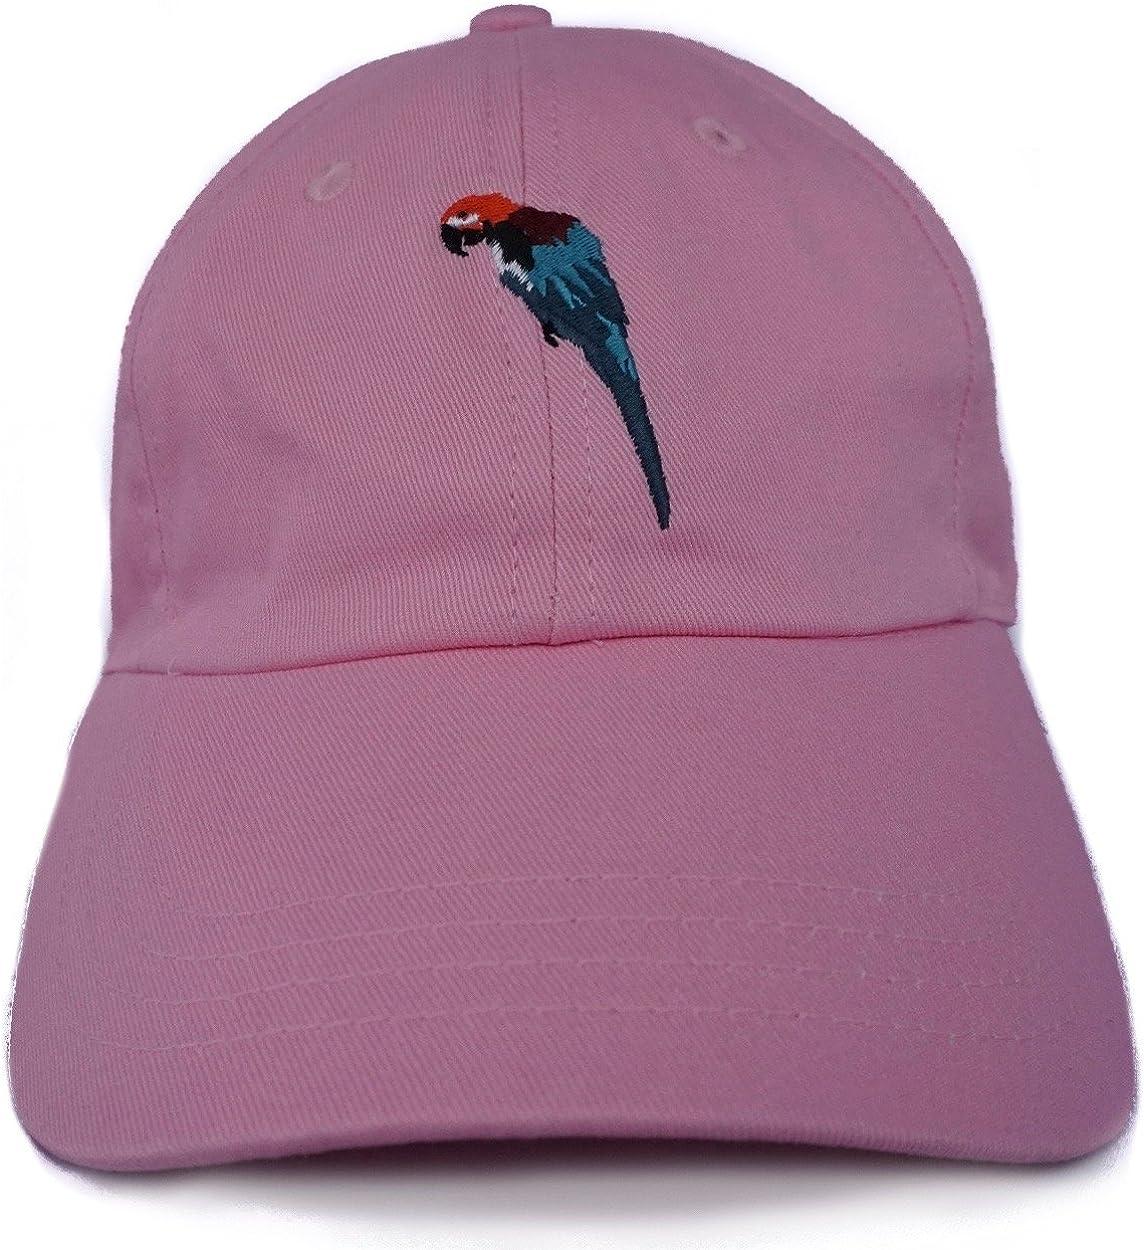 row + low Parrot Kids Size Dad High order - Hat Cotton Adjustable Time sale Pink Cap